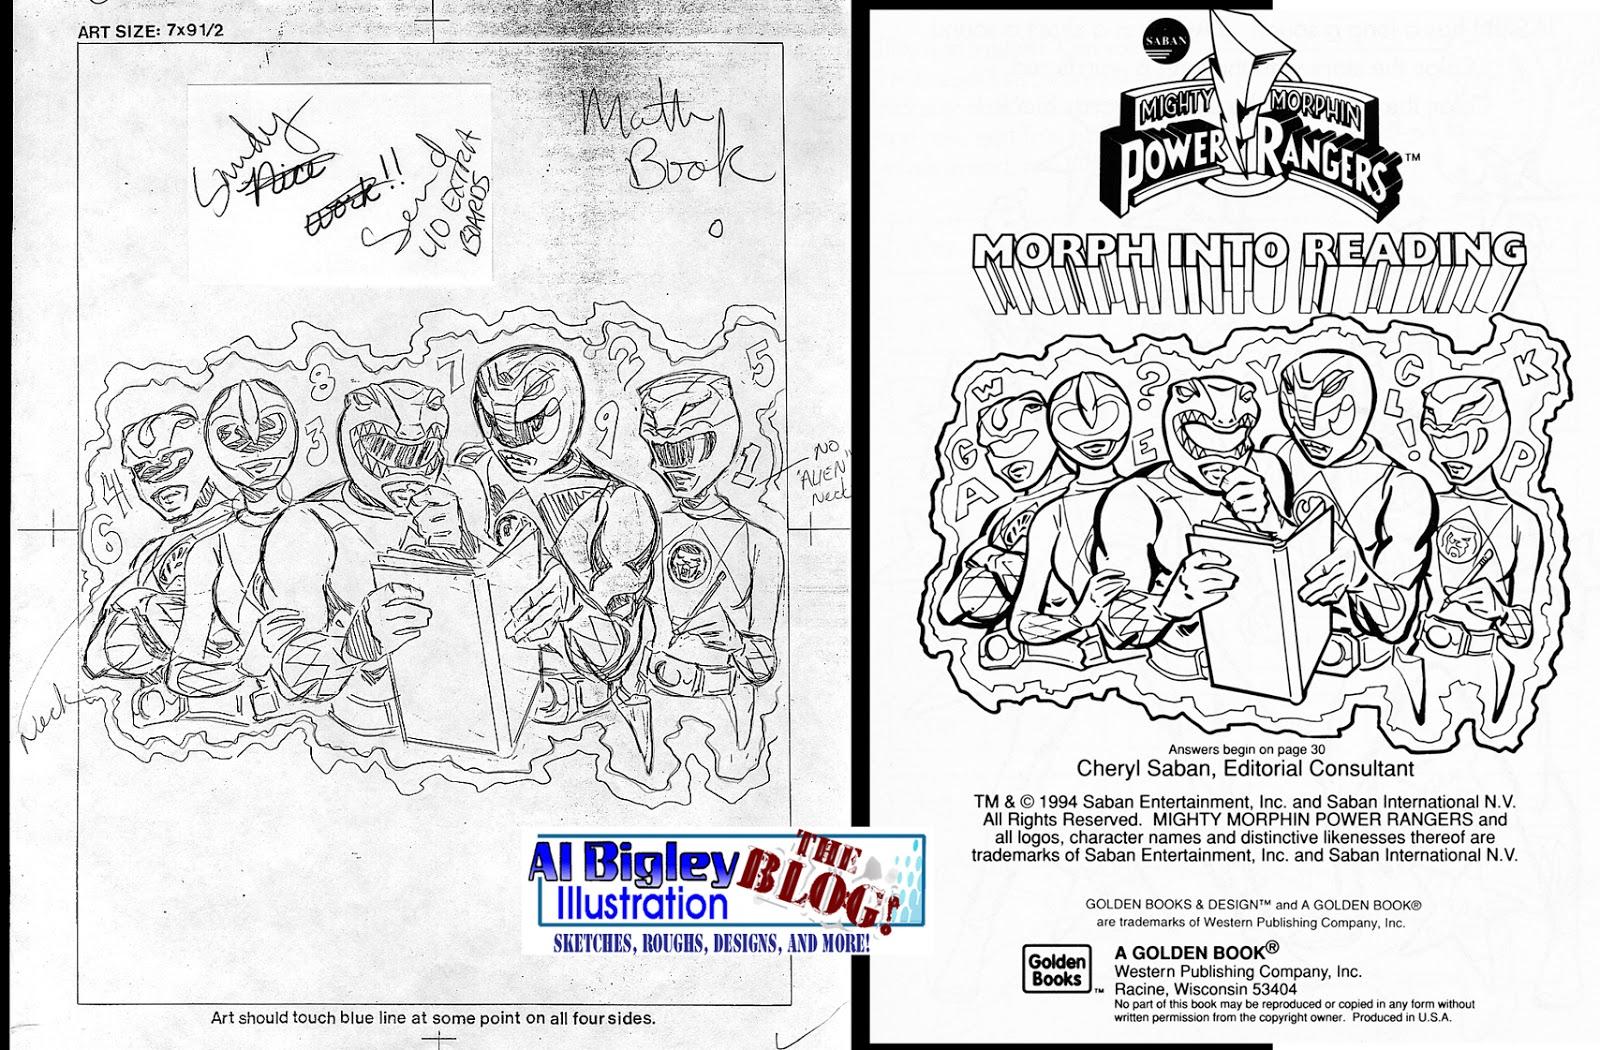 Al Bigley Illustration The Blog